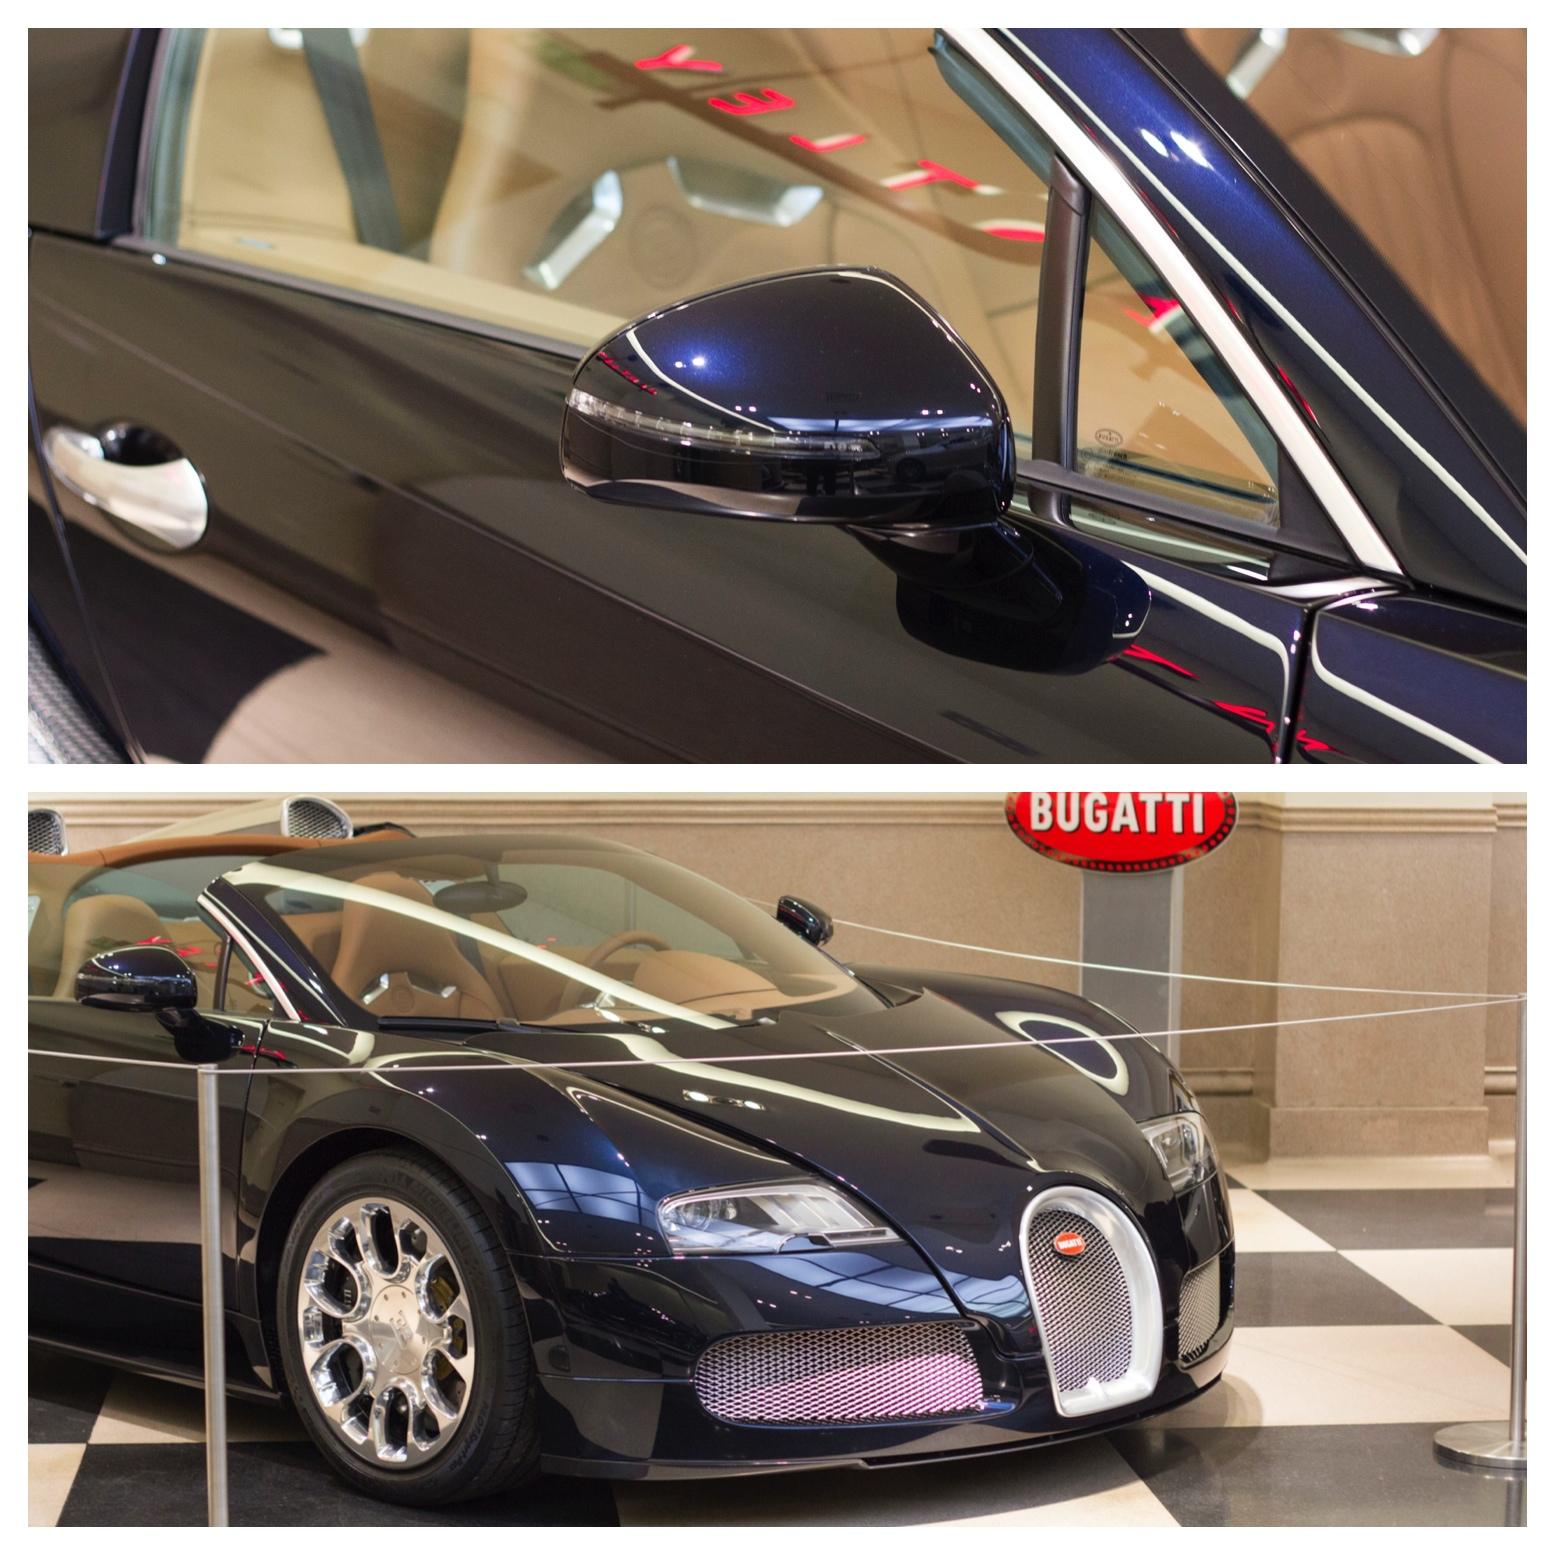 Last Orders for Bugatti Veyron